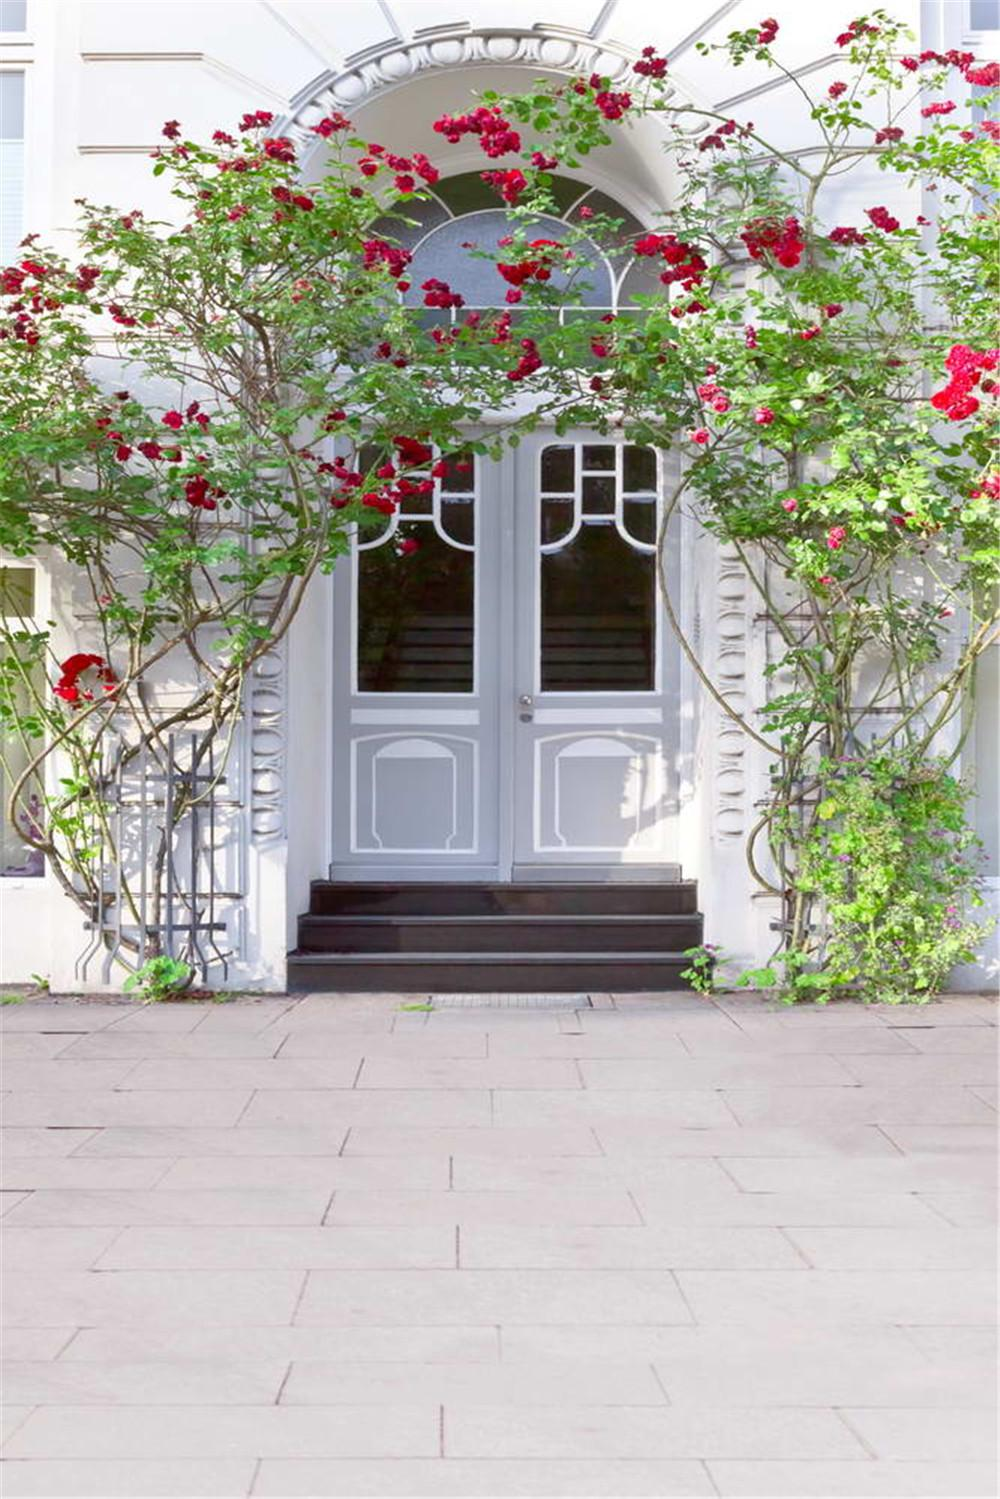 Outdoor House Białe Drzwi Romantyczny Ślub Photography Backdrops Red Roses Vines Schody Studio Photo Shoot Tle